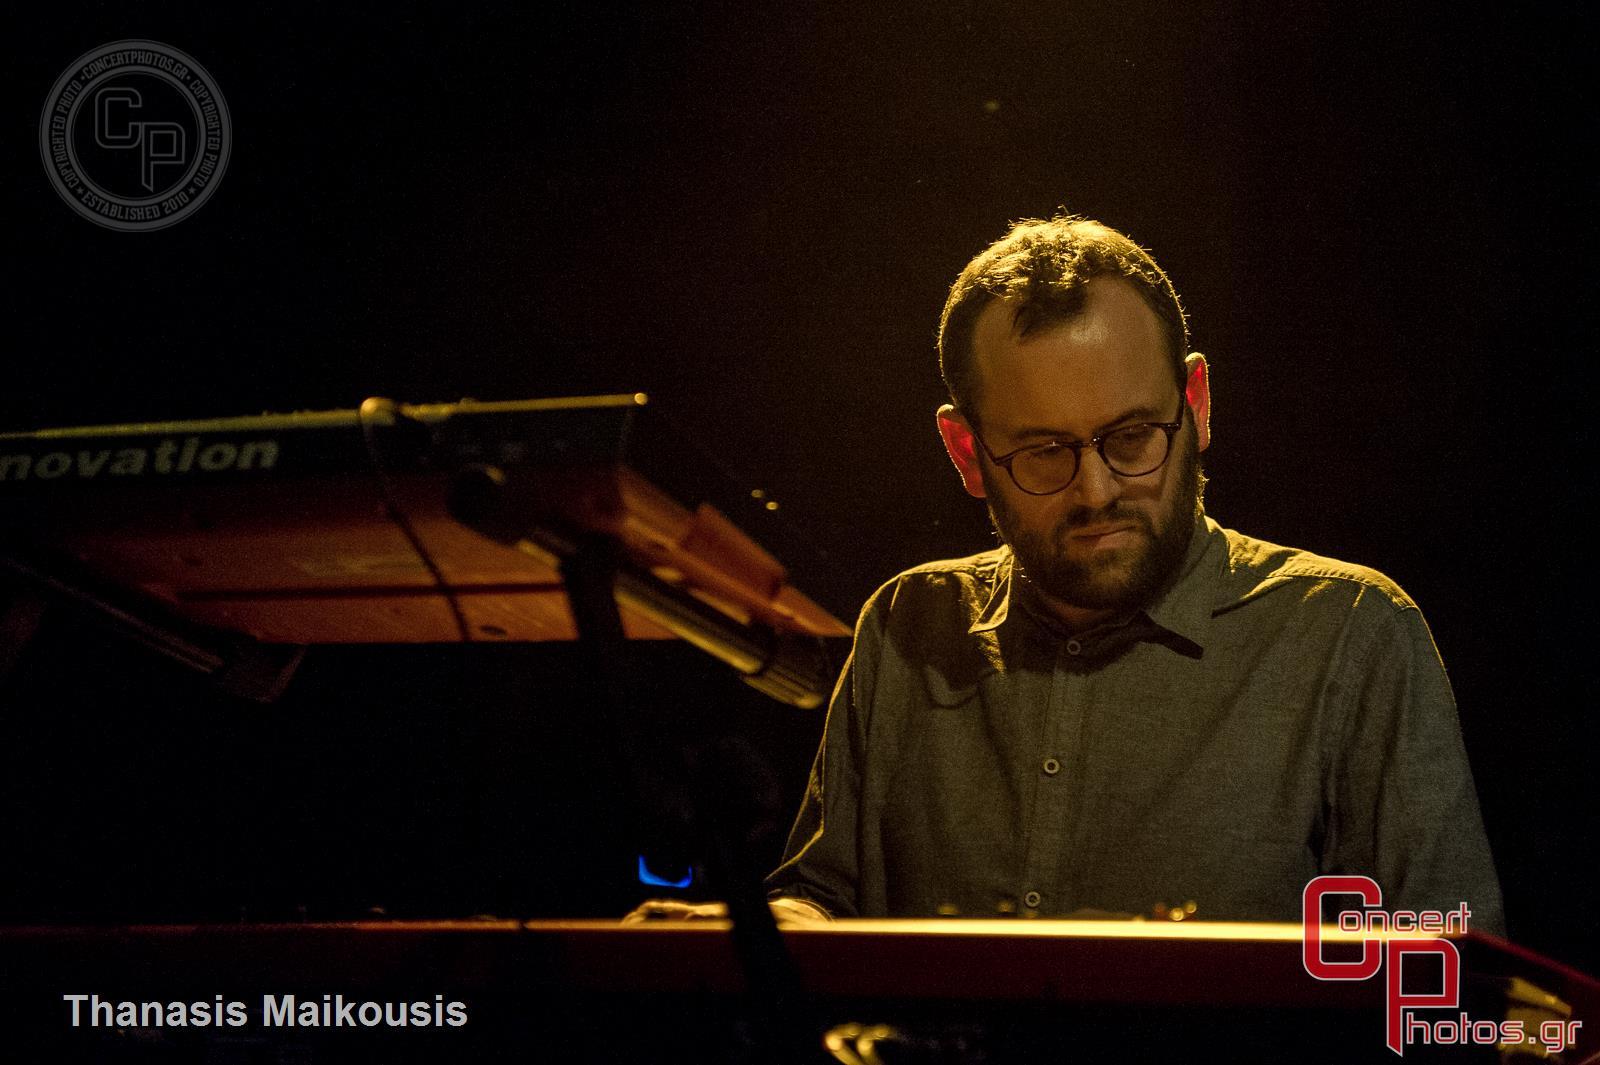 Quantic & Kill Emil -Quantic Kill Emil Gagarin photographer: Thanasis Maikousis - ConcertPhotos - 20141023_2247_36